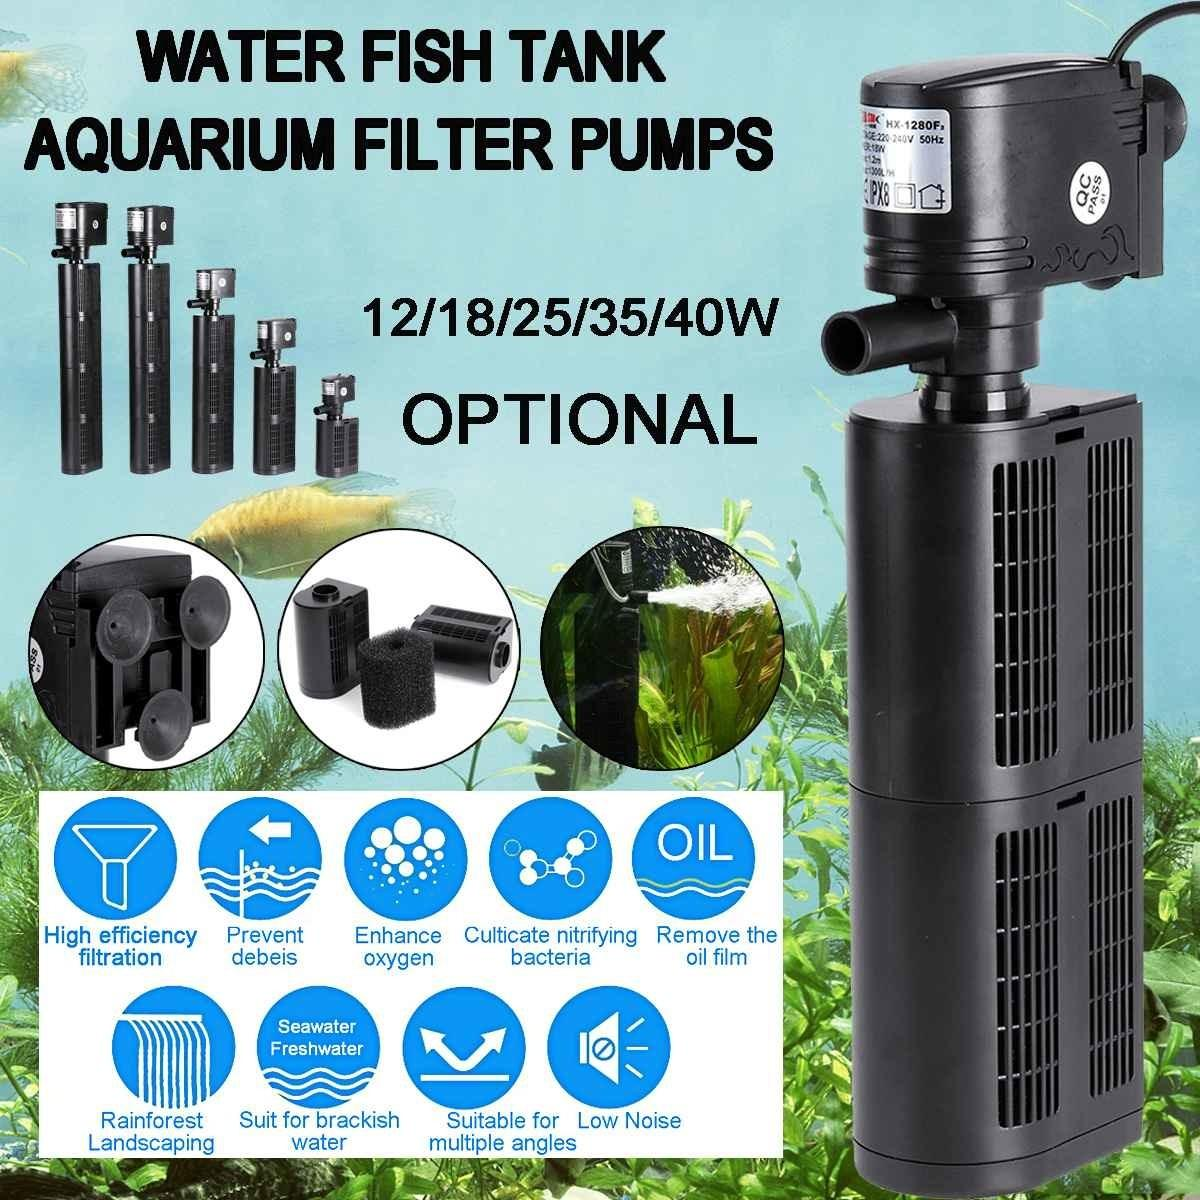 3 in 1 Fish Tank Aquarium Filter Pump Submersible Air Pump Air Oxygen Increase Aquarium Internal Filter Pump 12/18/25/35/40W Y200917